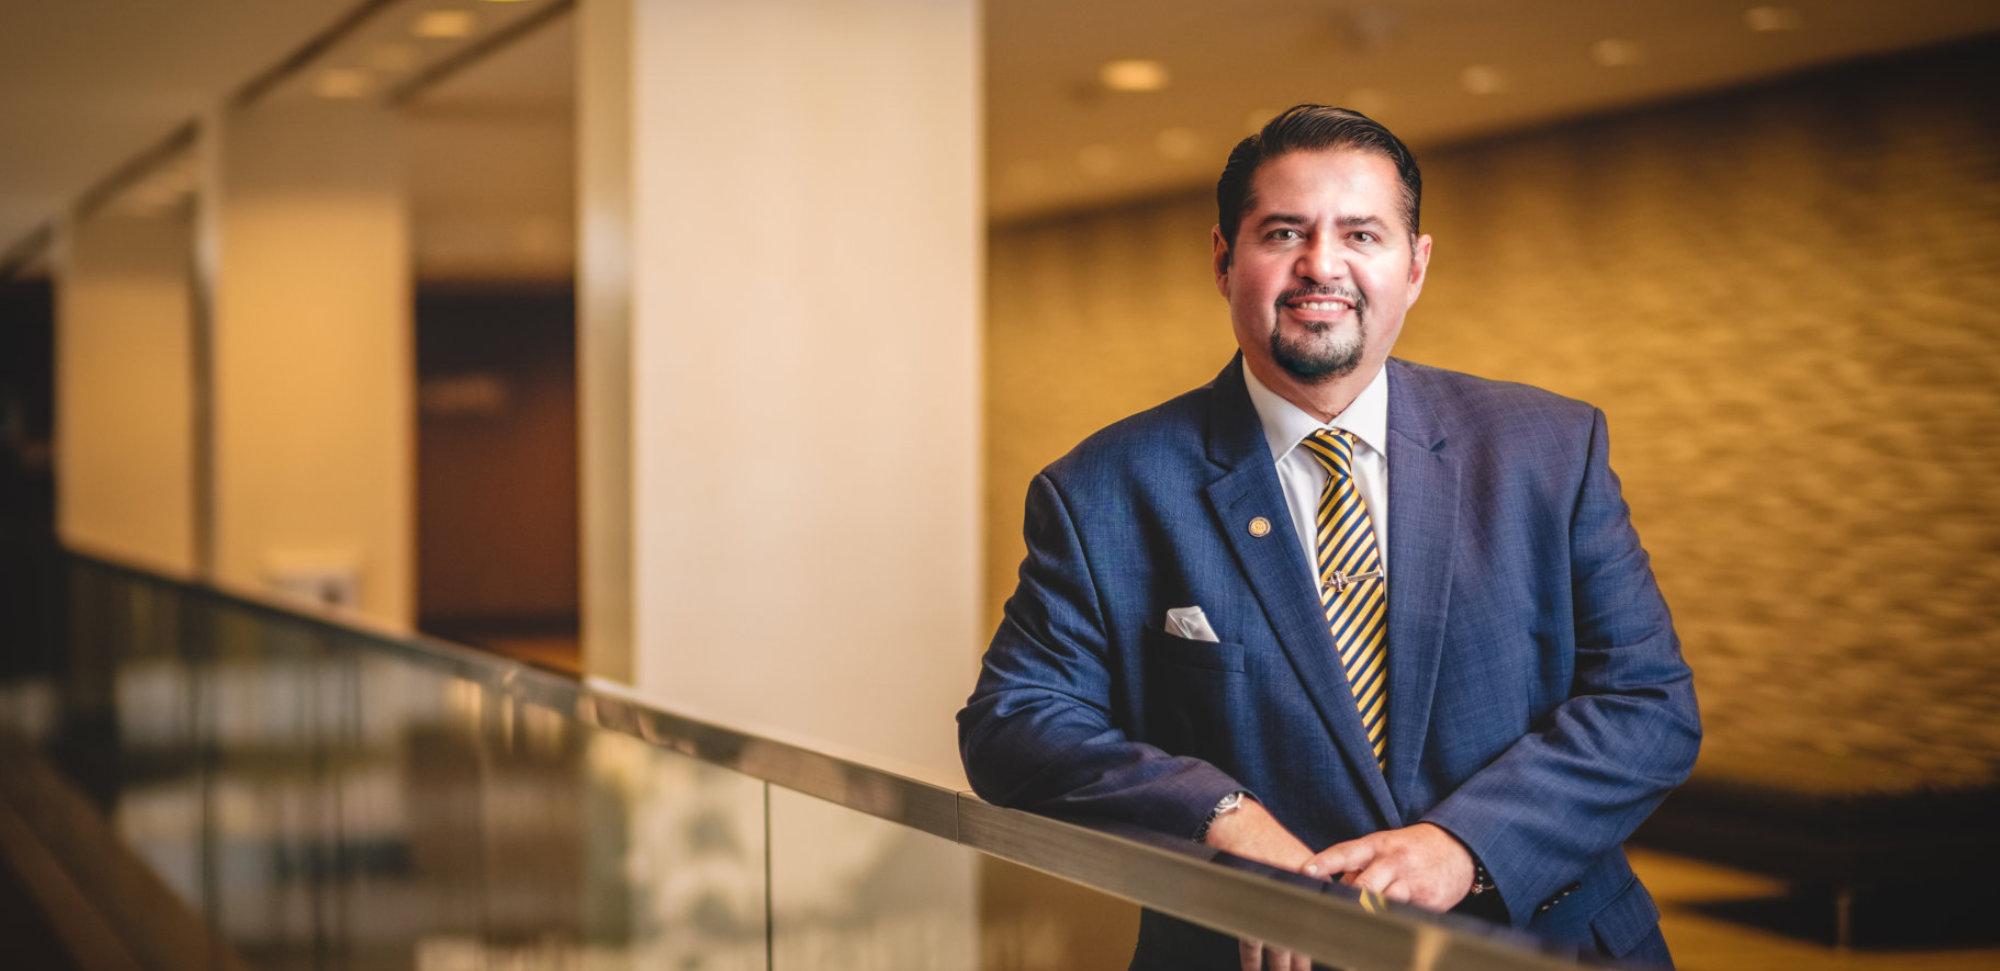 Attorney Joe Flores smiling